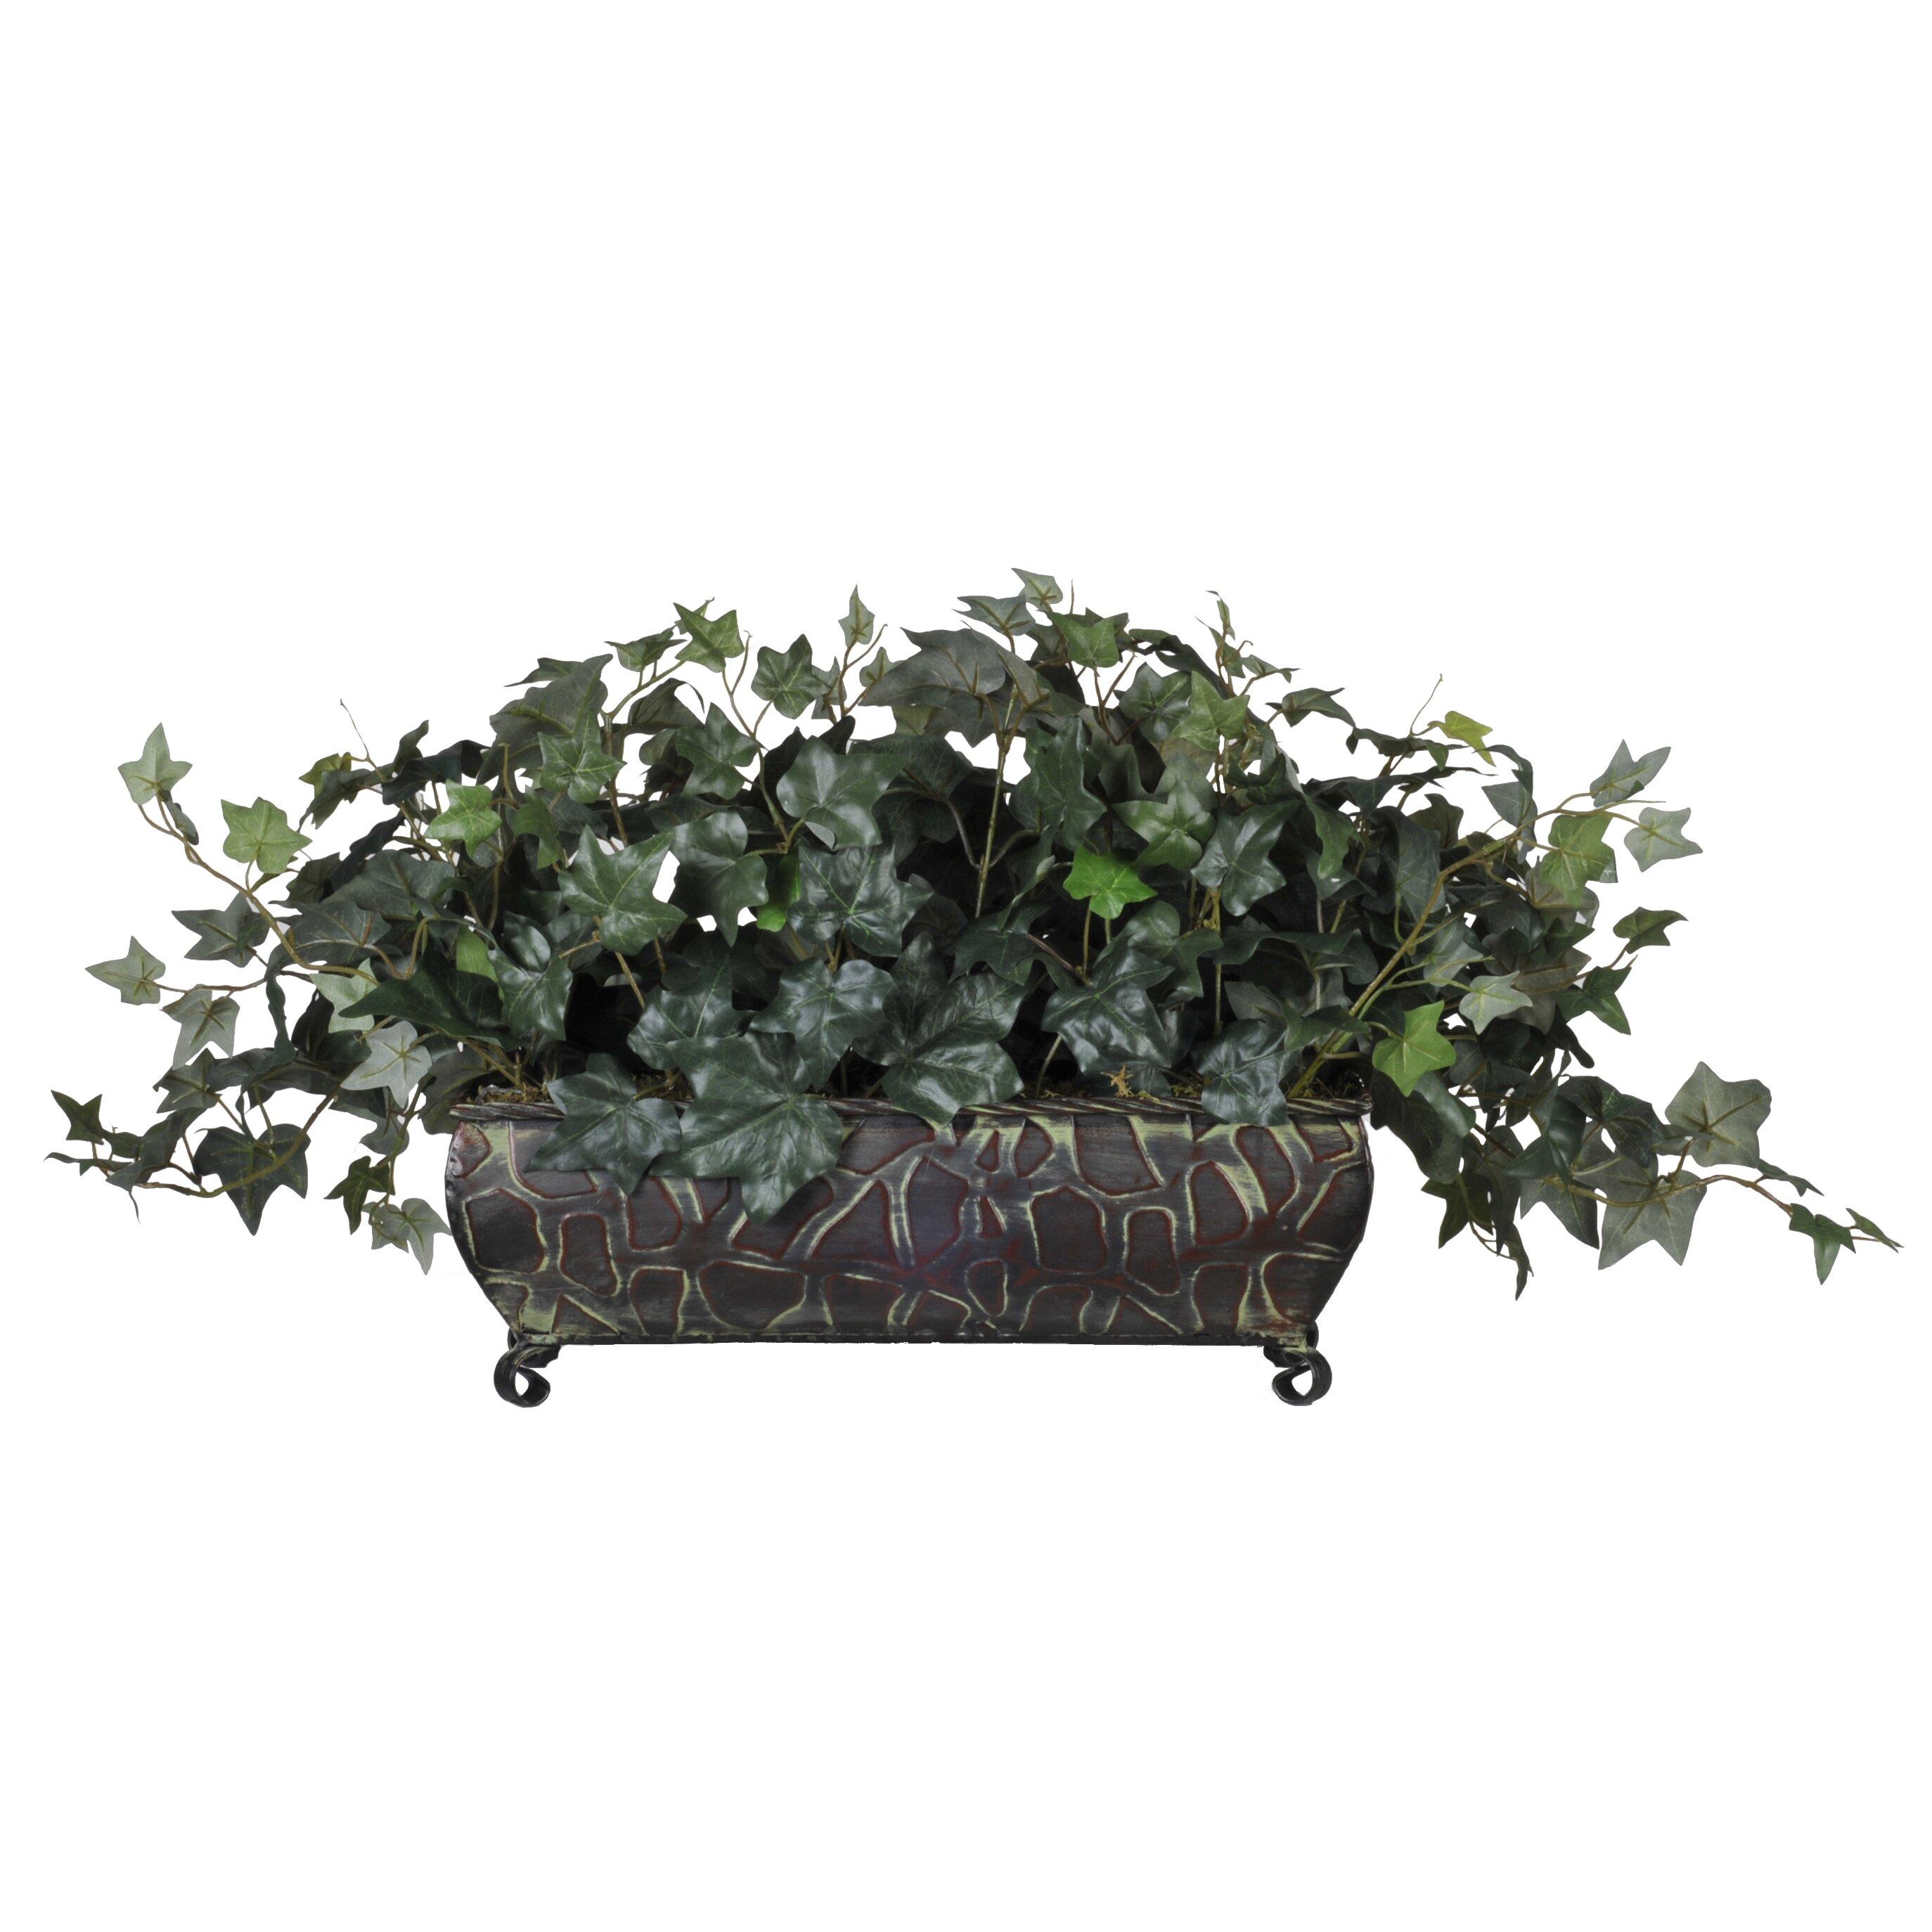 House of silk flowers artificial english ivy ledge desk for Plante a planter